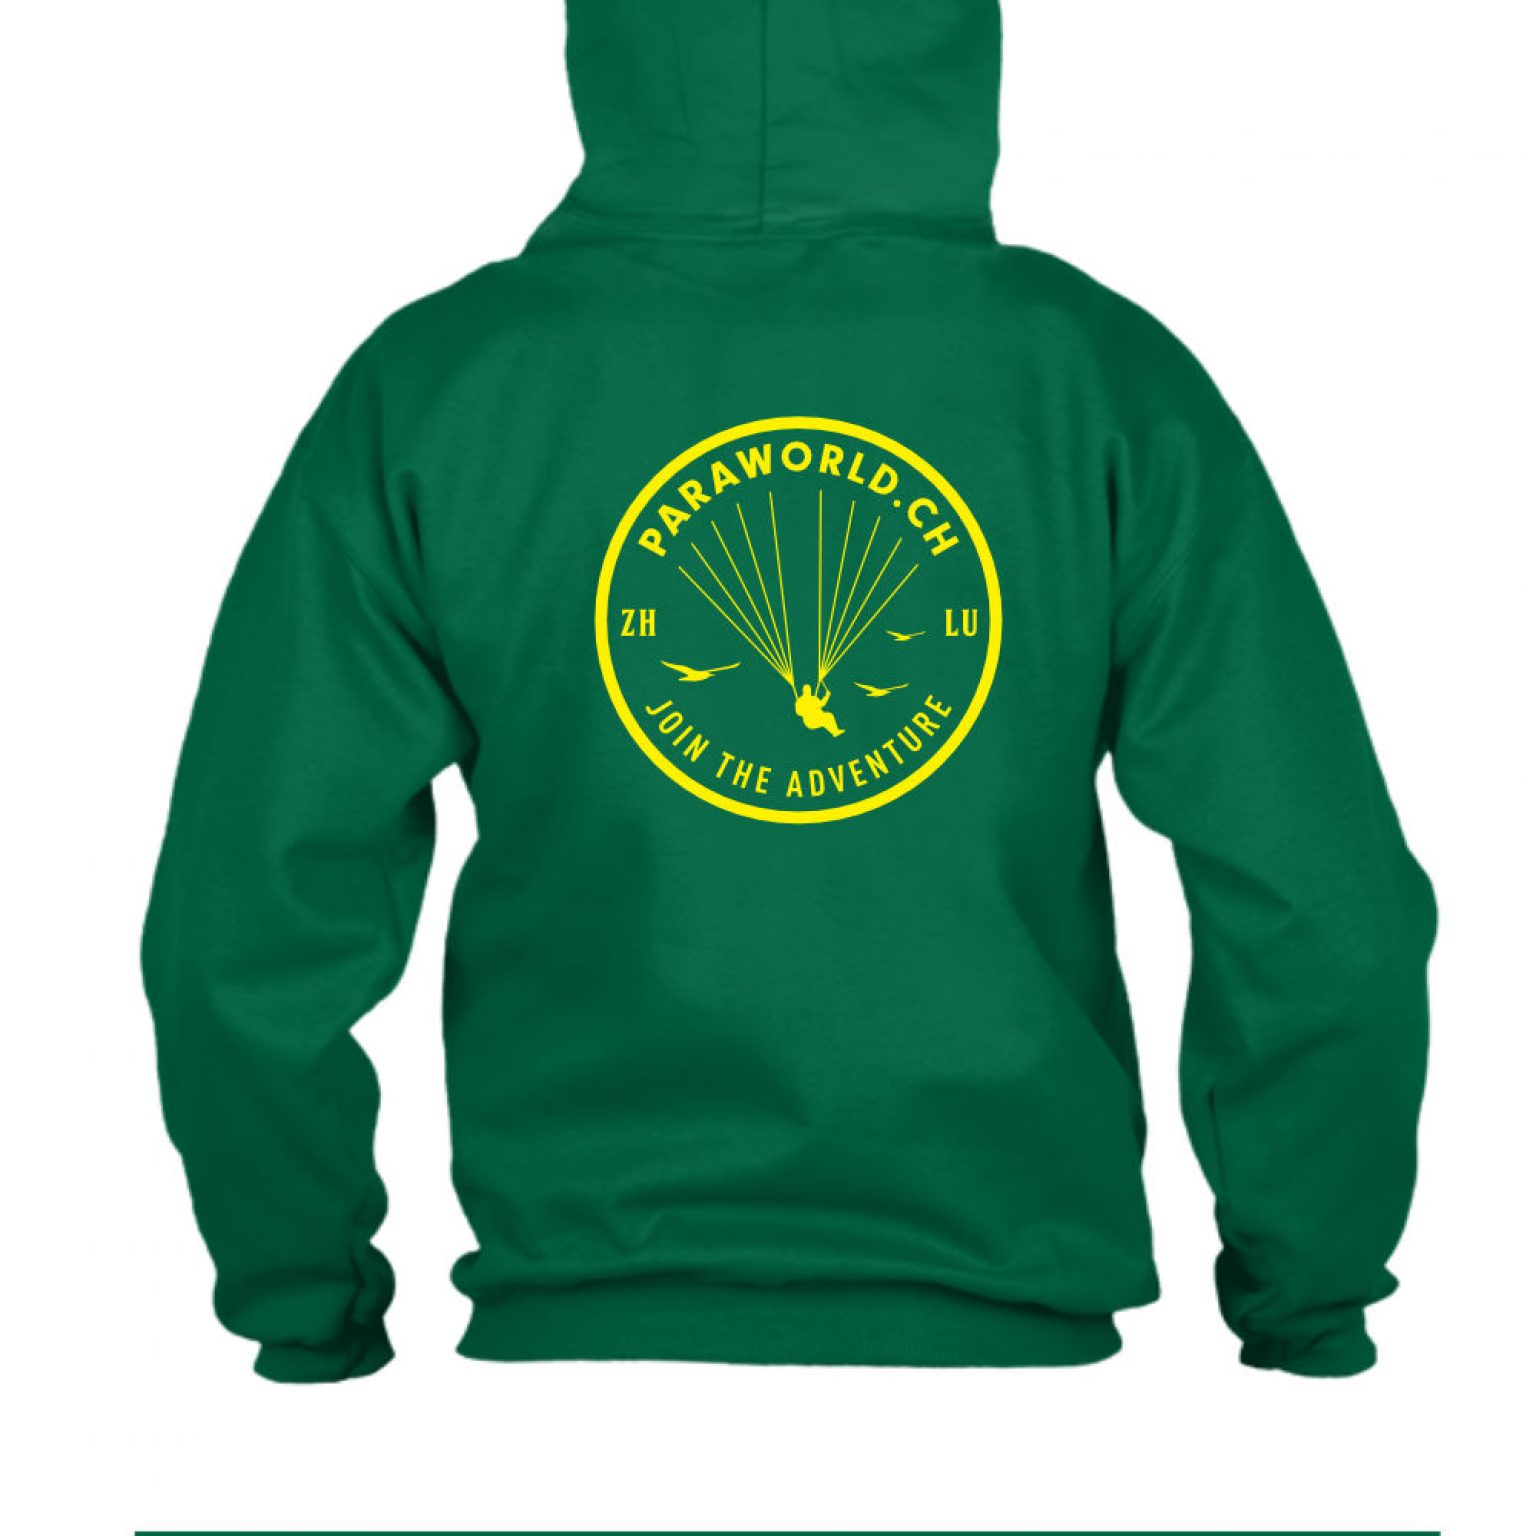 JTA b hoodie herren green back